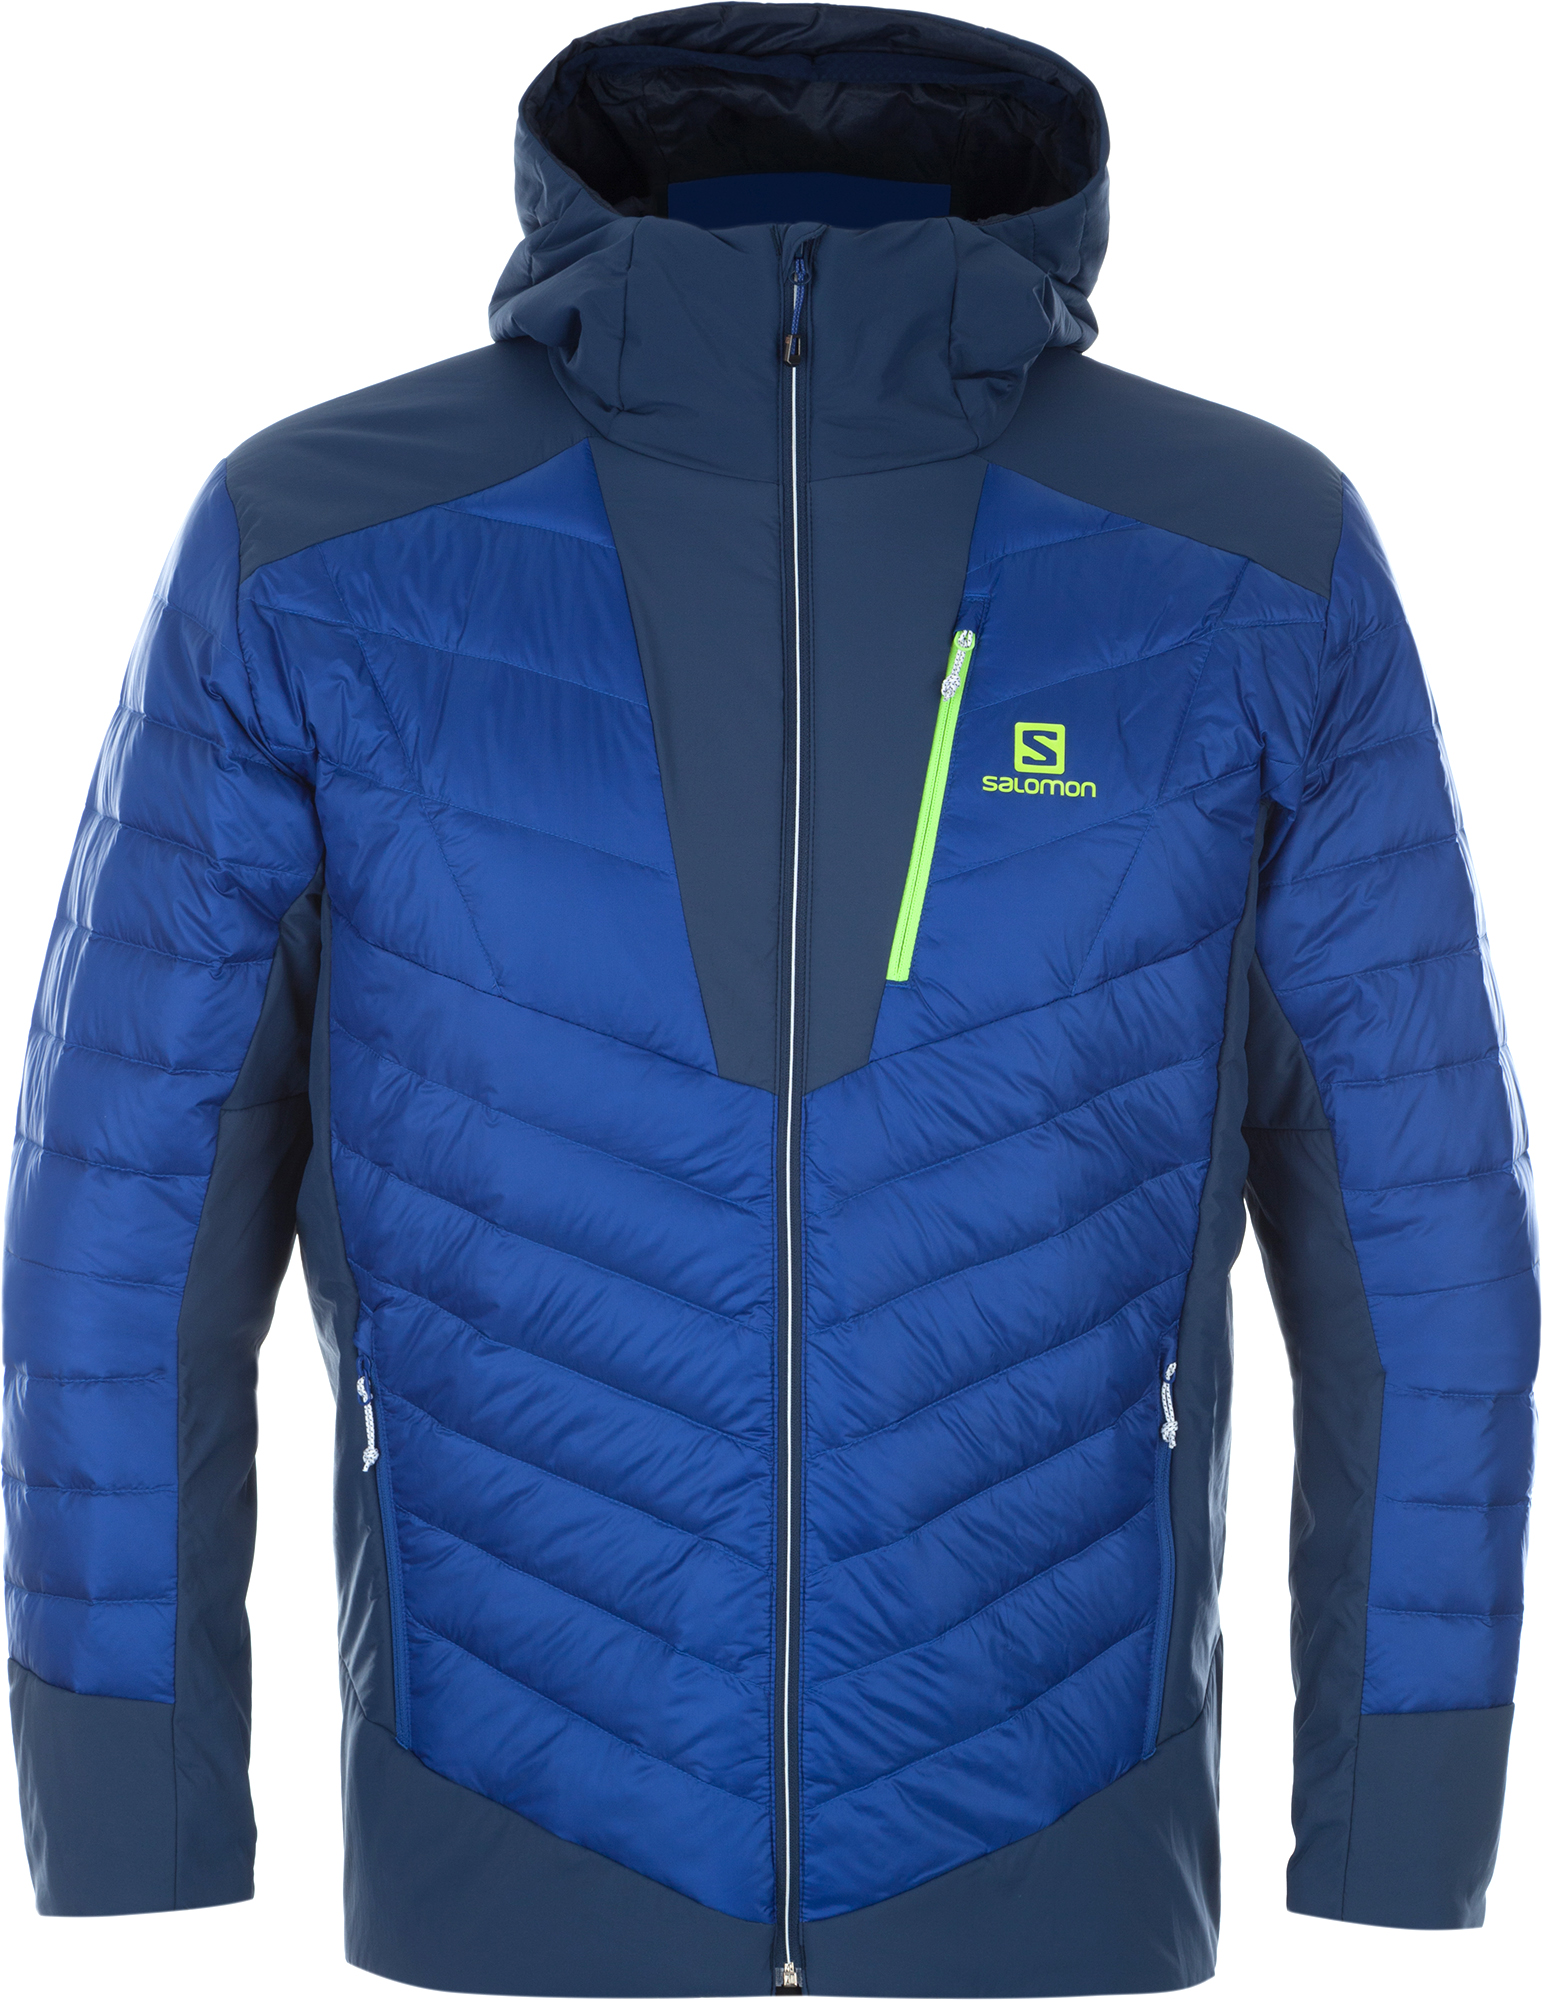 Salomon Куртка пуховая мужская Salomon X Alp salomon перчатки купить